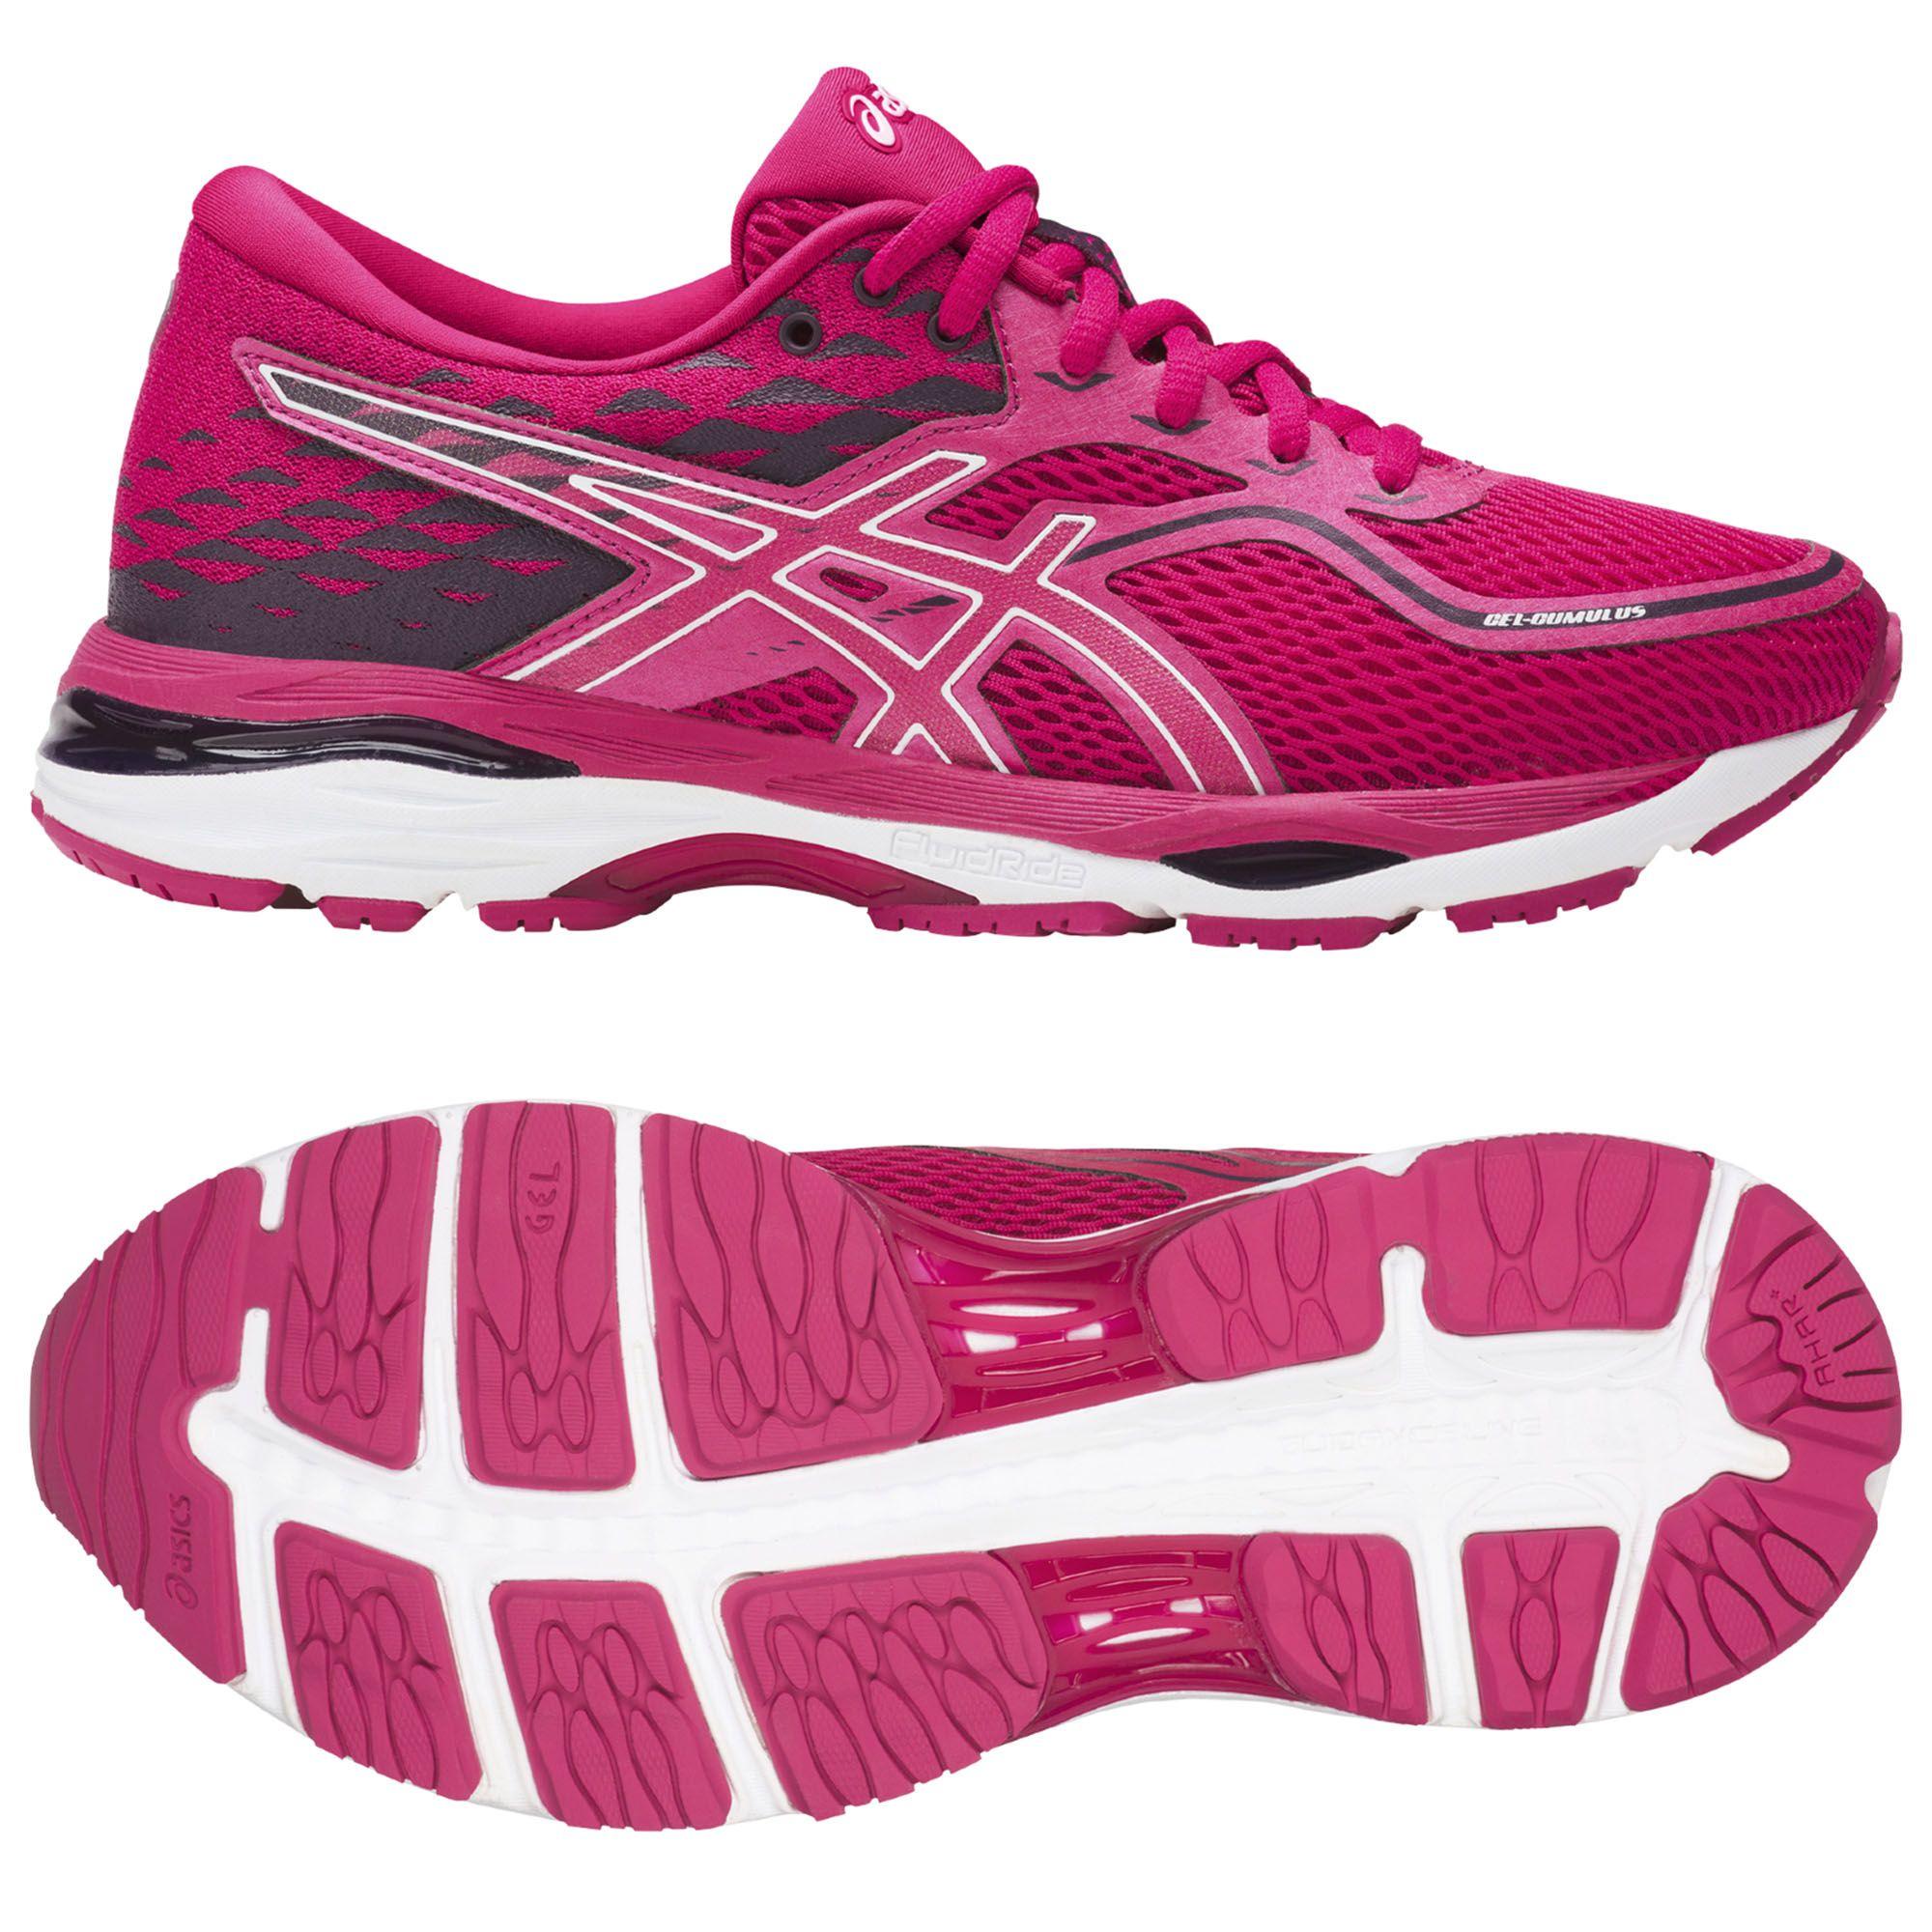 asics gel cumulus 19 ladies running shoes aw17. Black Bedroom Furniture Sets. Home Design Ideas